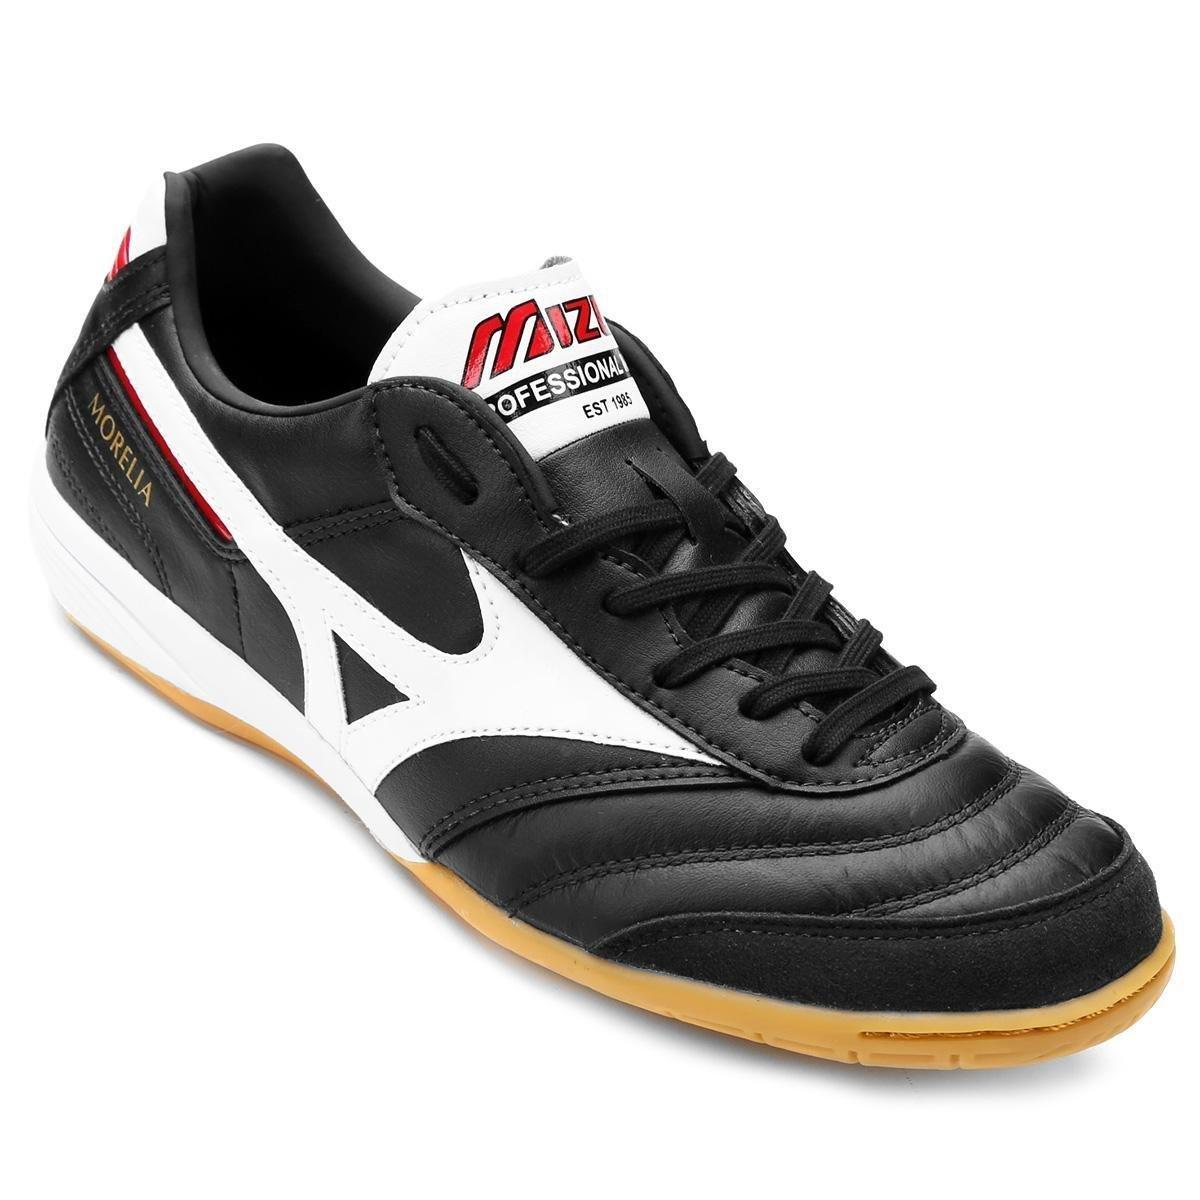 db9dc39486453 Achetez en ligne une large gamme de tenis mizuno morelia futsal ...